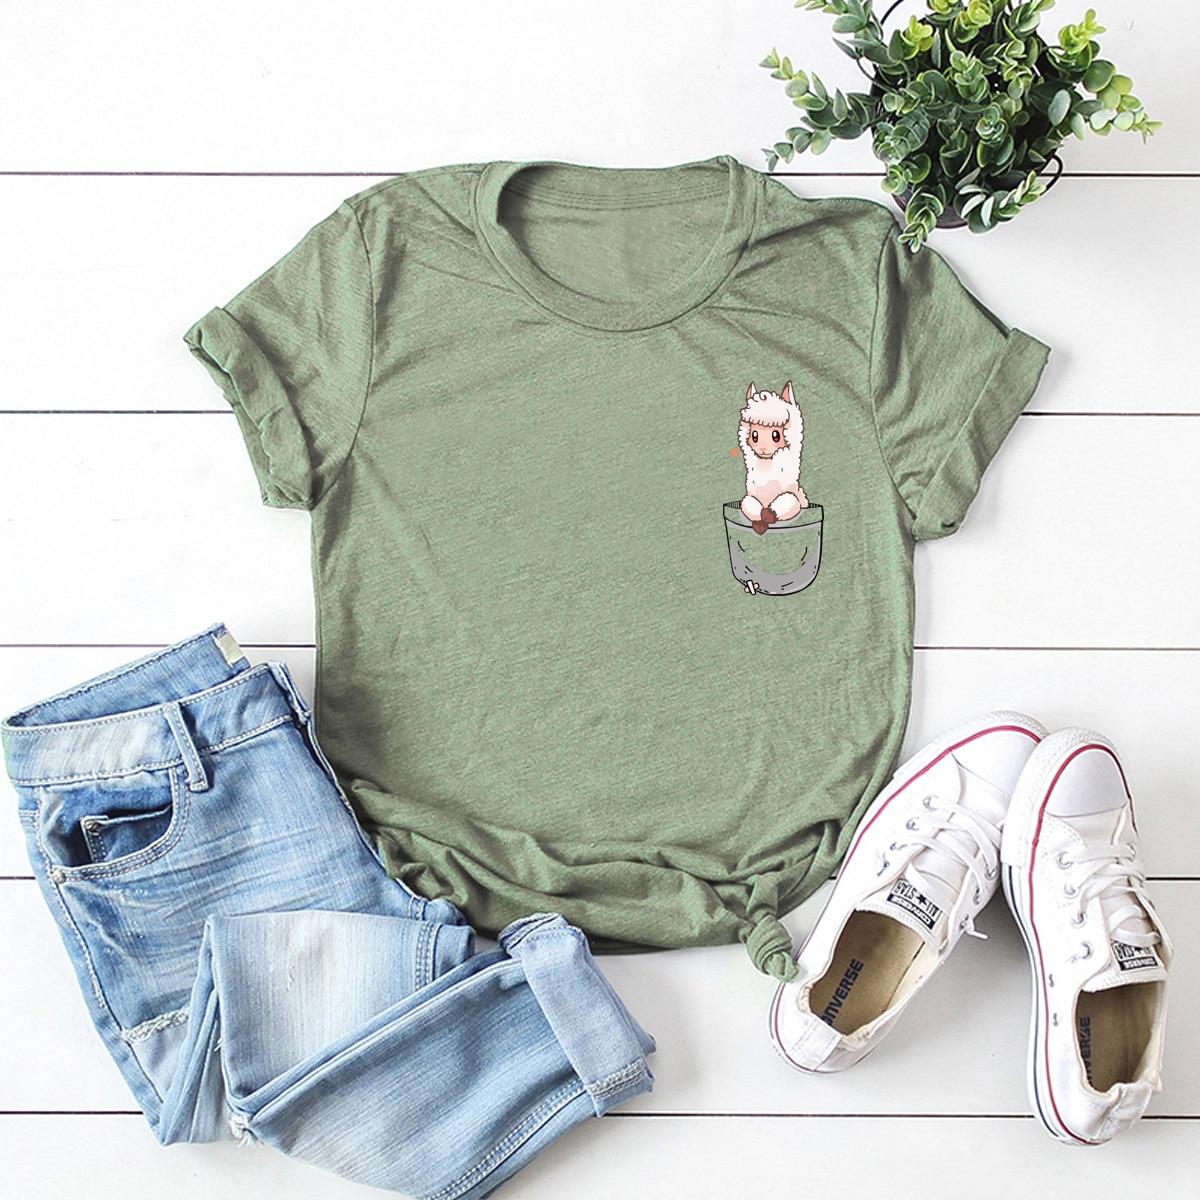 Pocket Alpaca Print Women Cotton T Shirt Short Sleeve T-Shirt Female Casual Tops Tee Funny T Shirts Camisetas